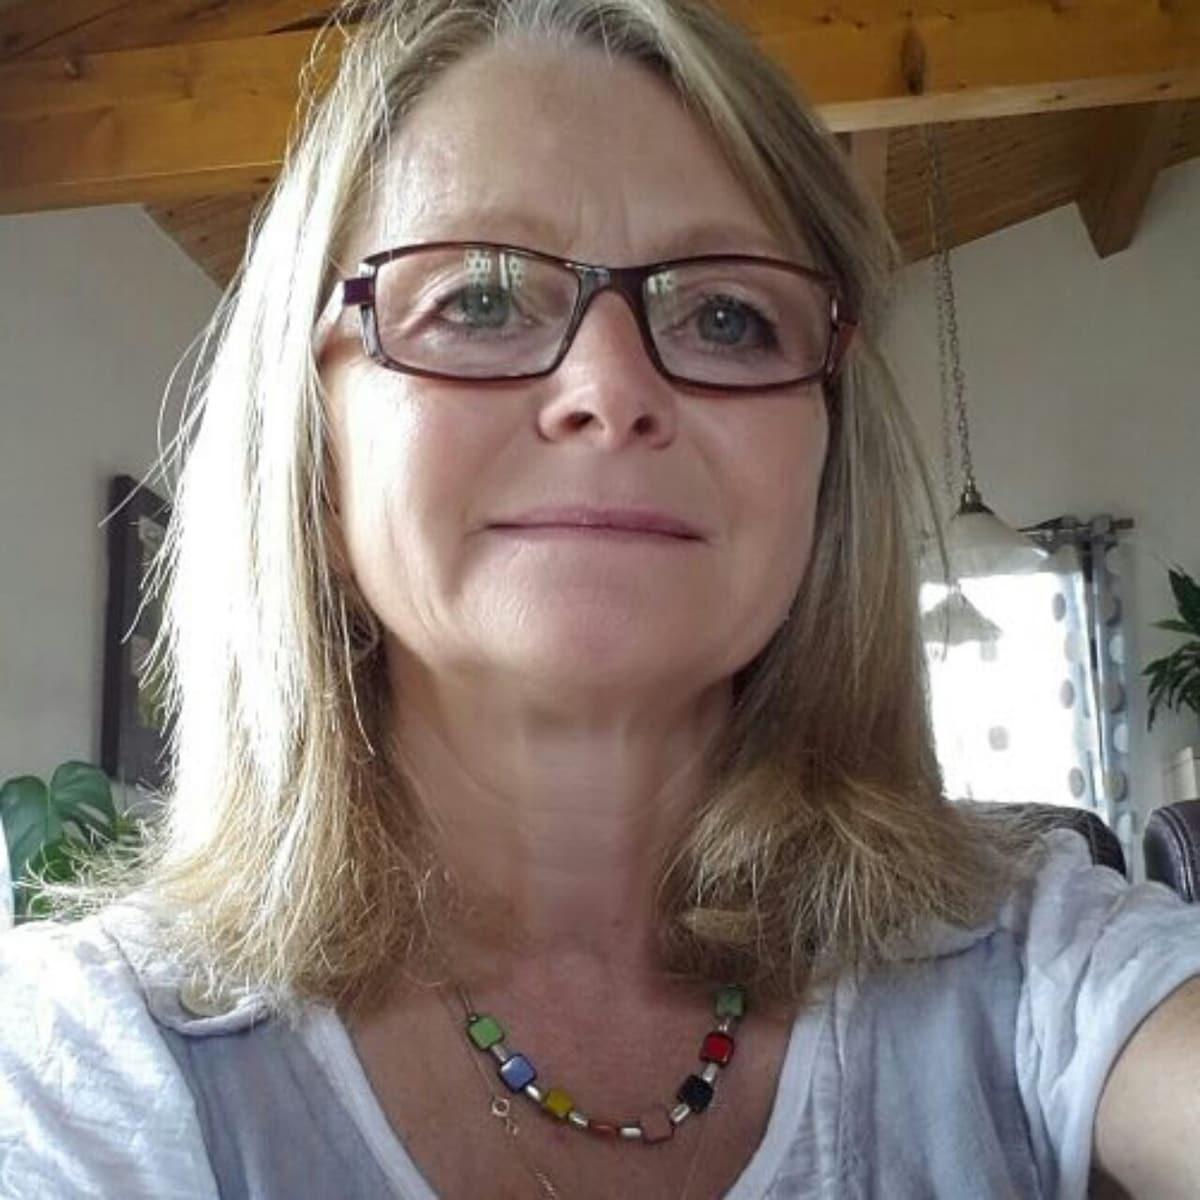 Martine from Puilboreau